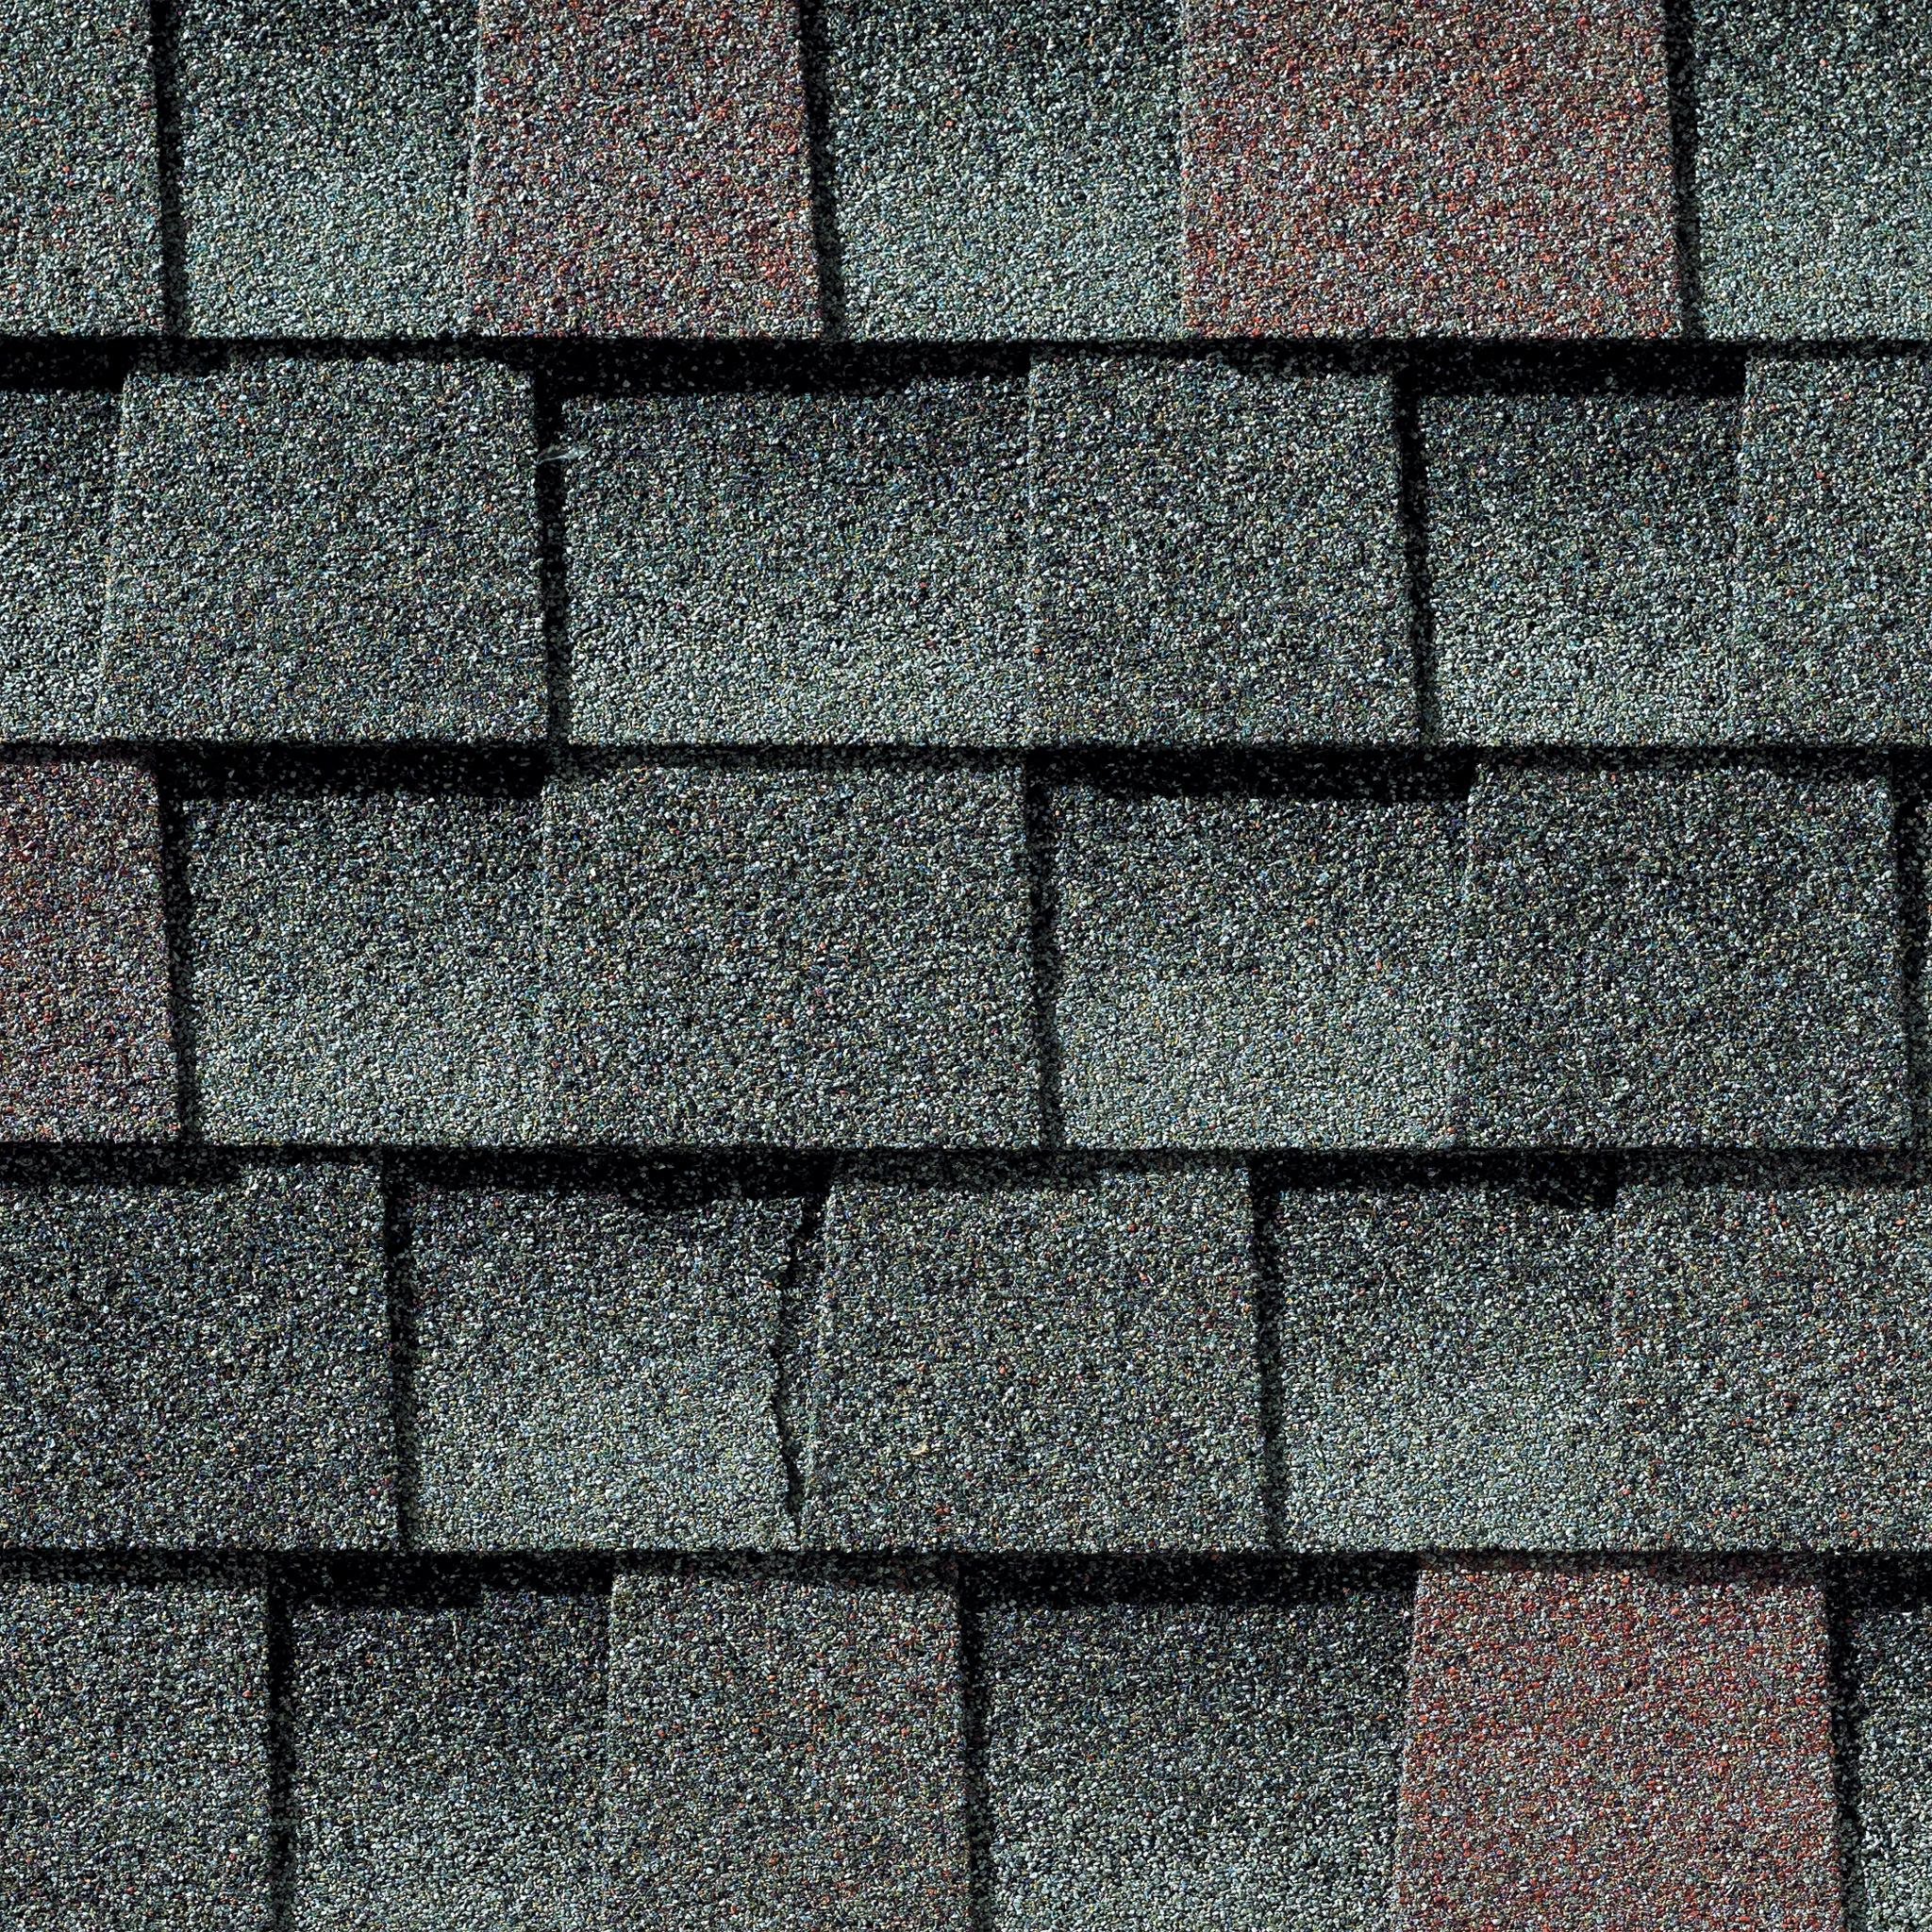 Close up photo of GAF's Timberline HD Williamsburg Slate shingle swatch